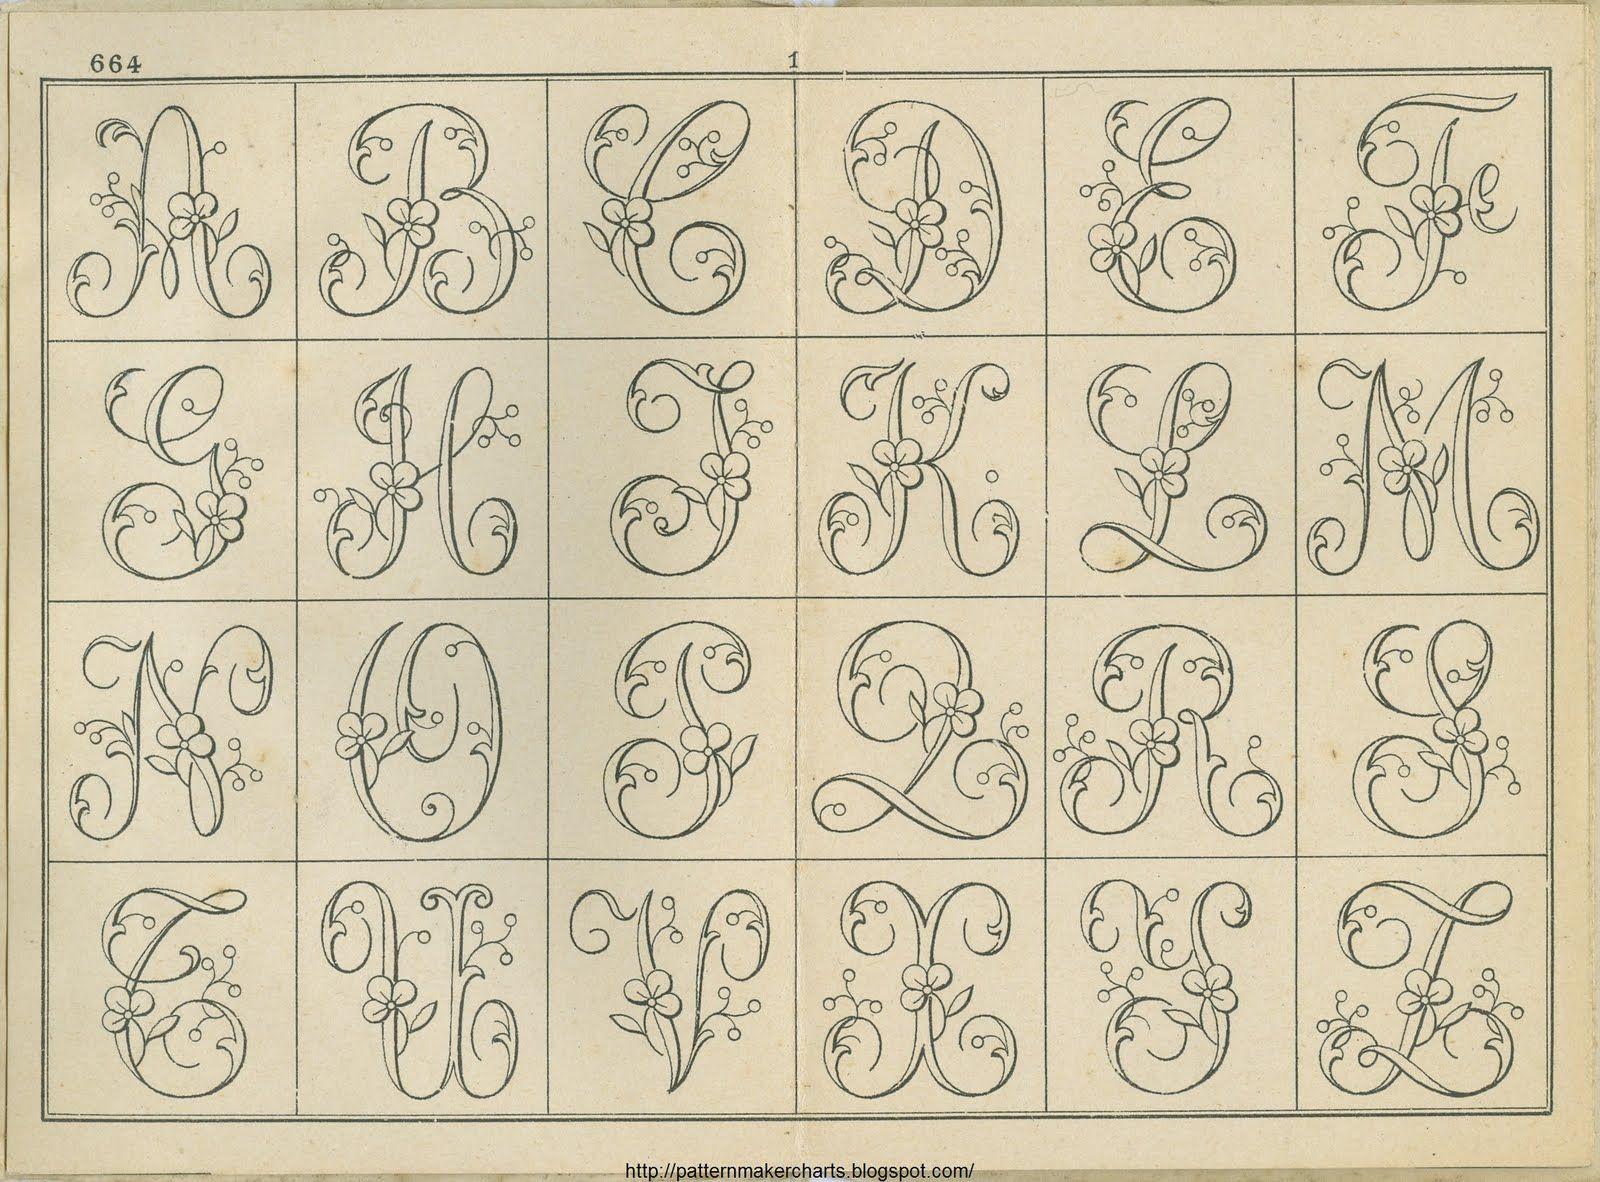 Pin de kimoeyoung en 자수 | Pinterest | Alfabeto, Letras y Bordado